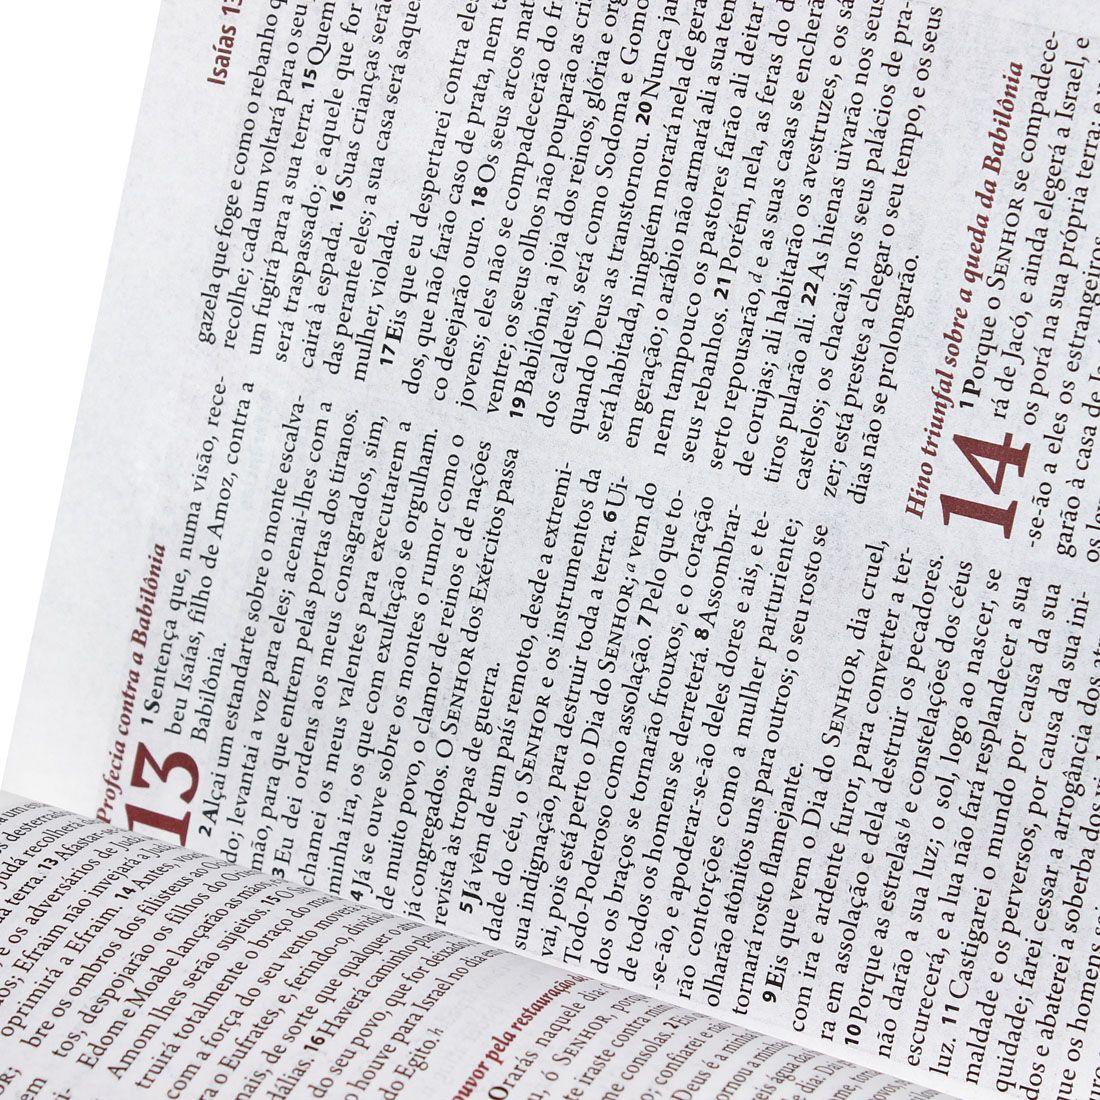 Bíblia Sagrada Feminina Evangélica de Estudo Capa Tulipa Formato Médio ARA